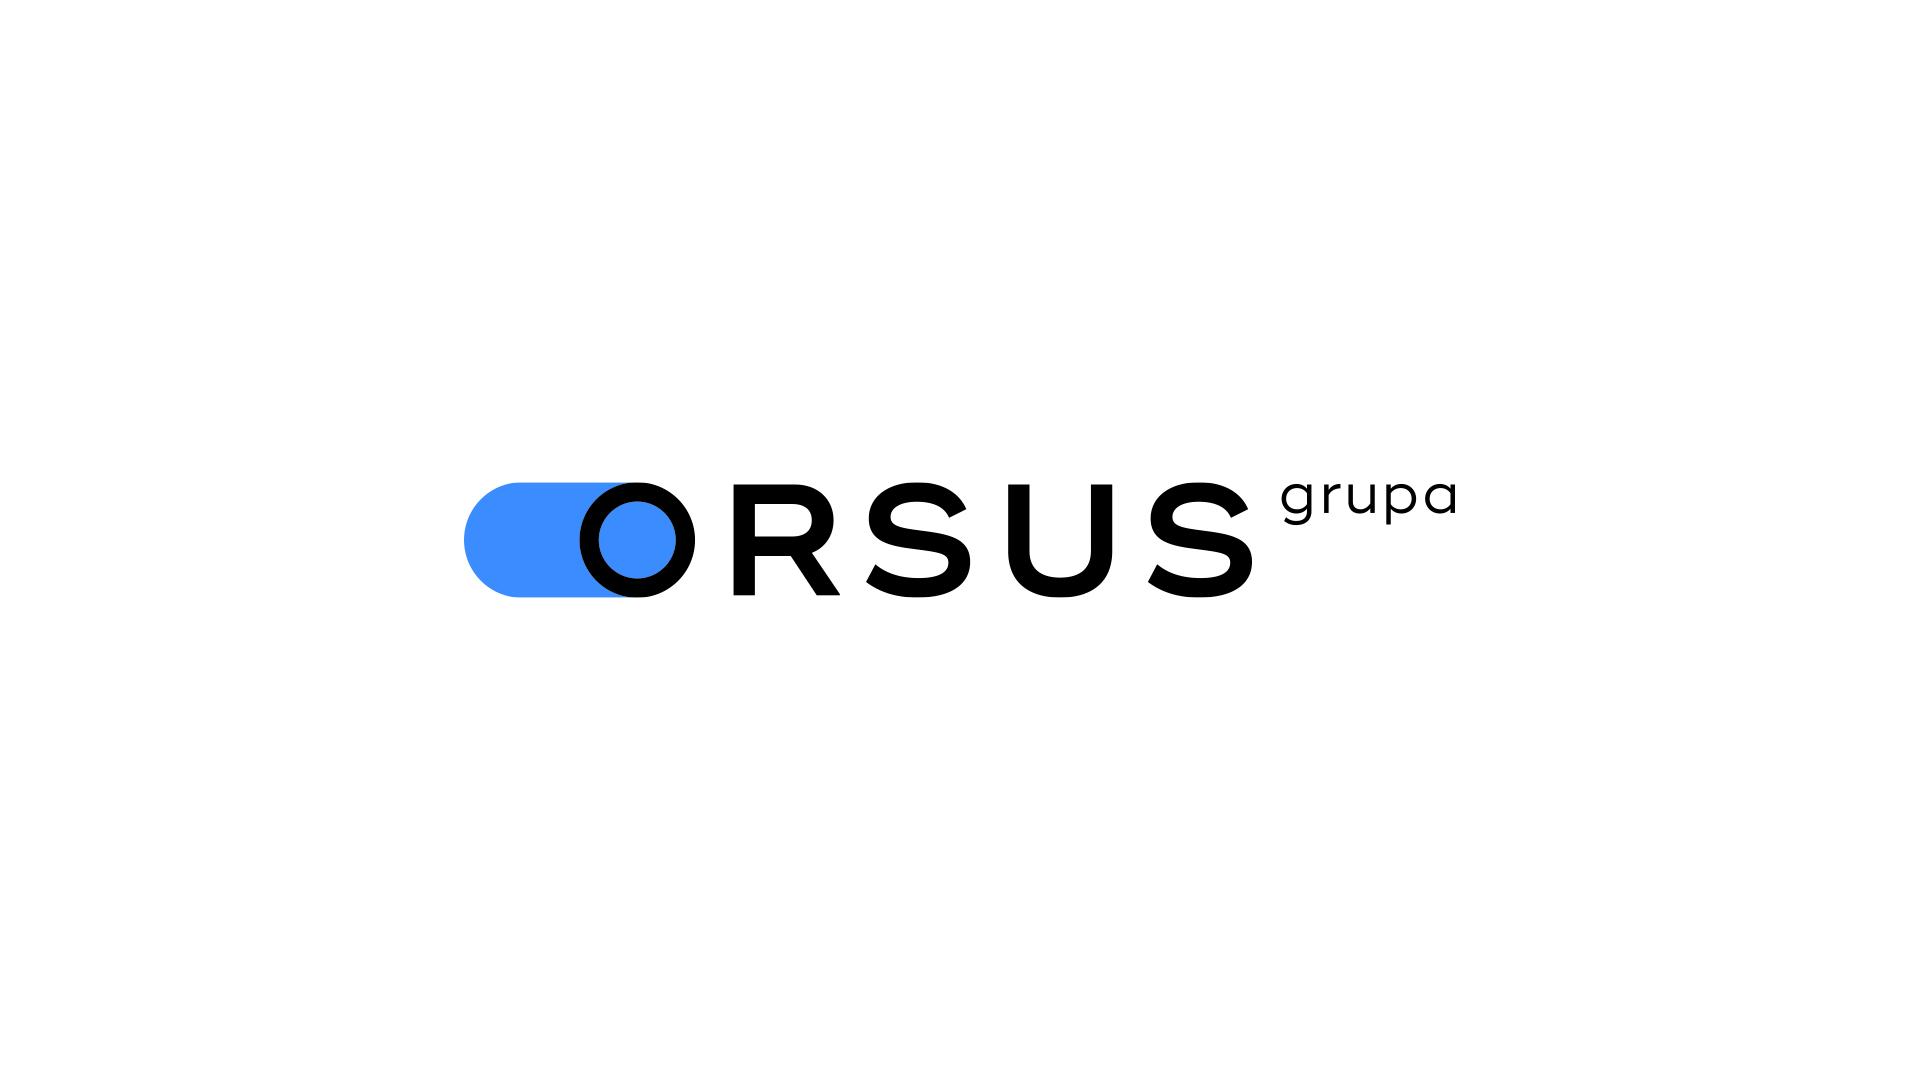 Orsus-grupa-logo-by-Emtisquare